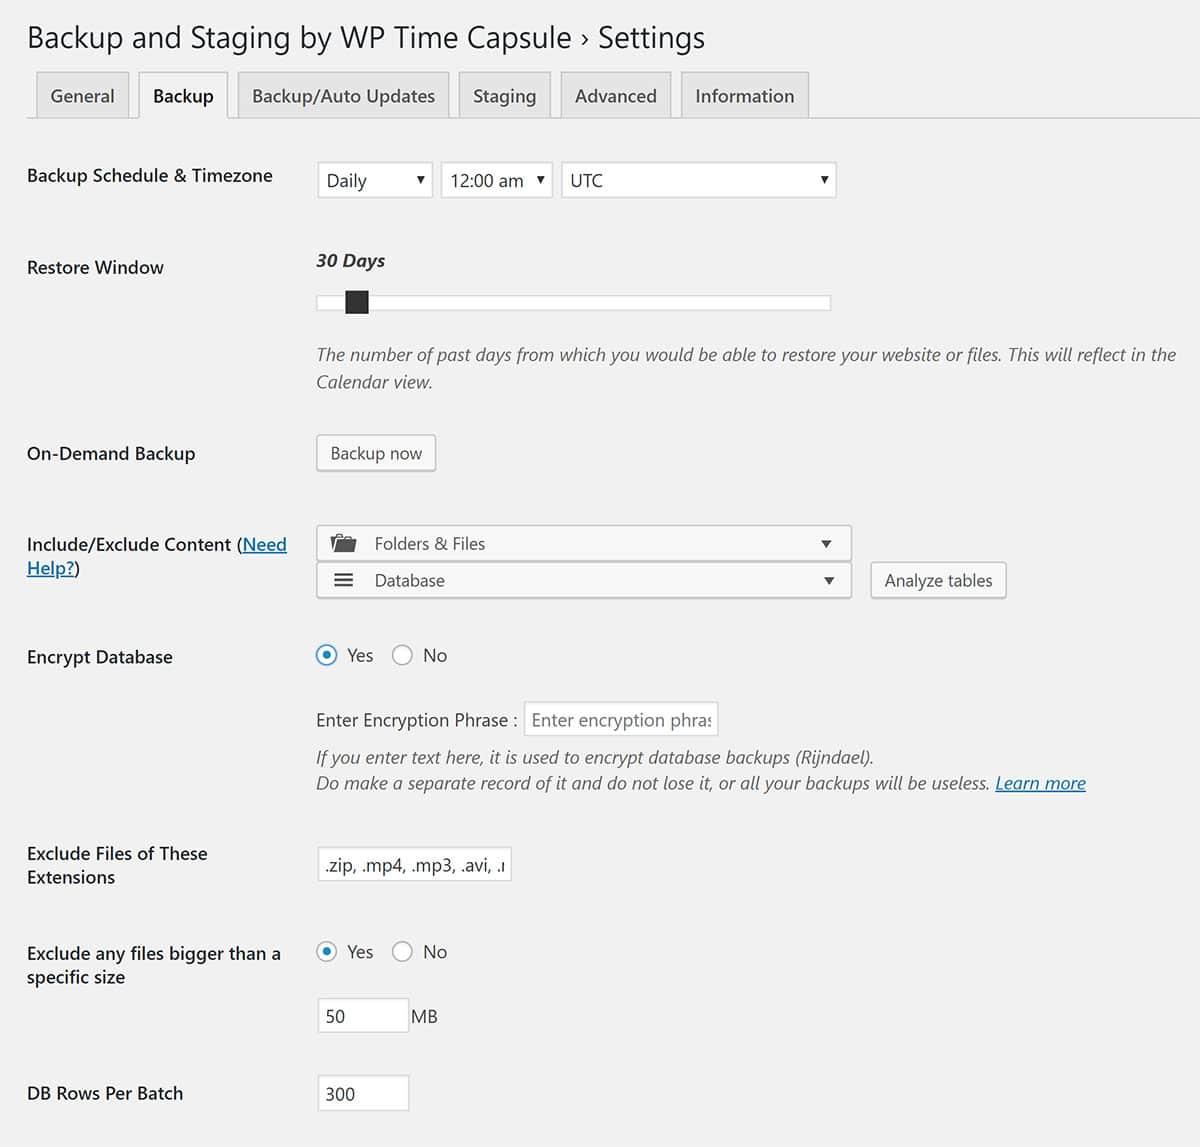 WP Time Capsule Backup Settings